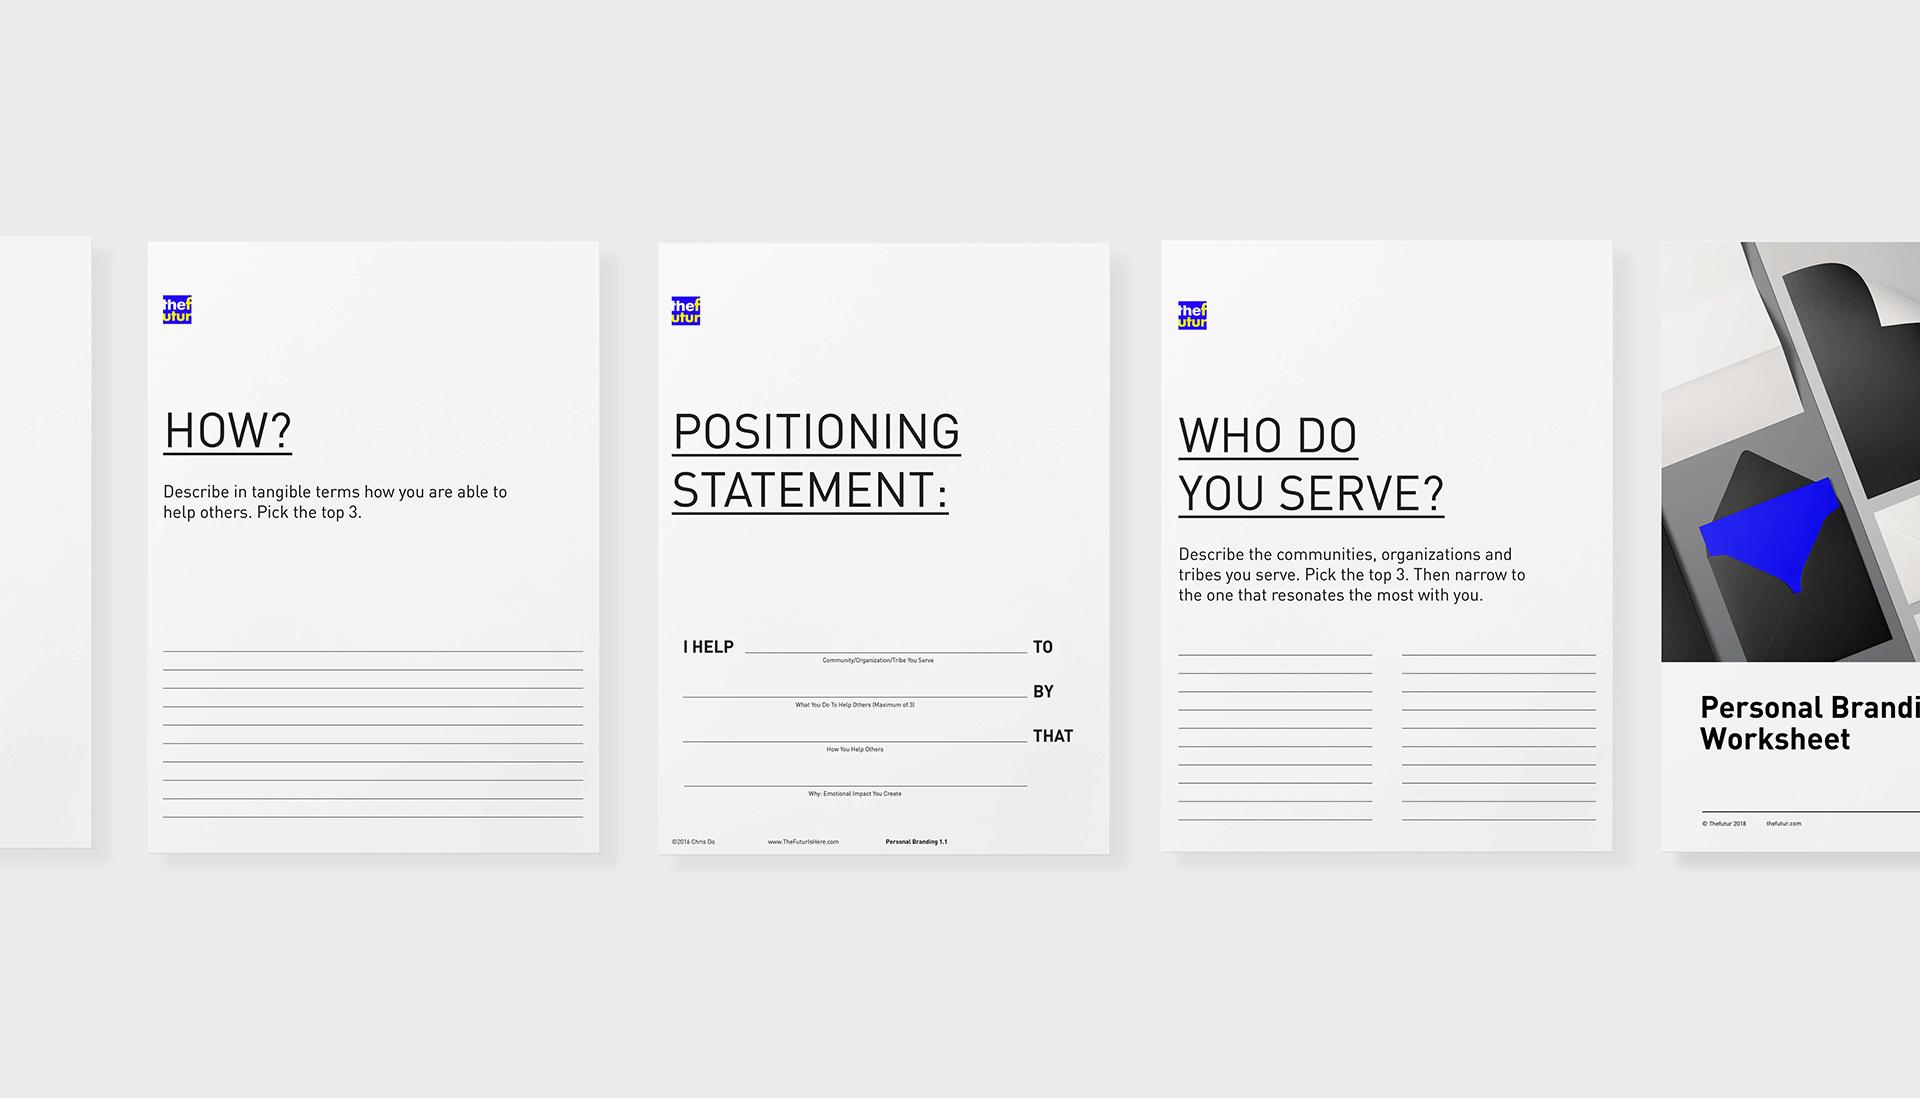 Personal Branding Worksheet Free Download